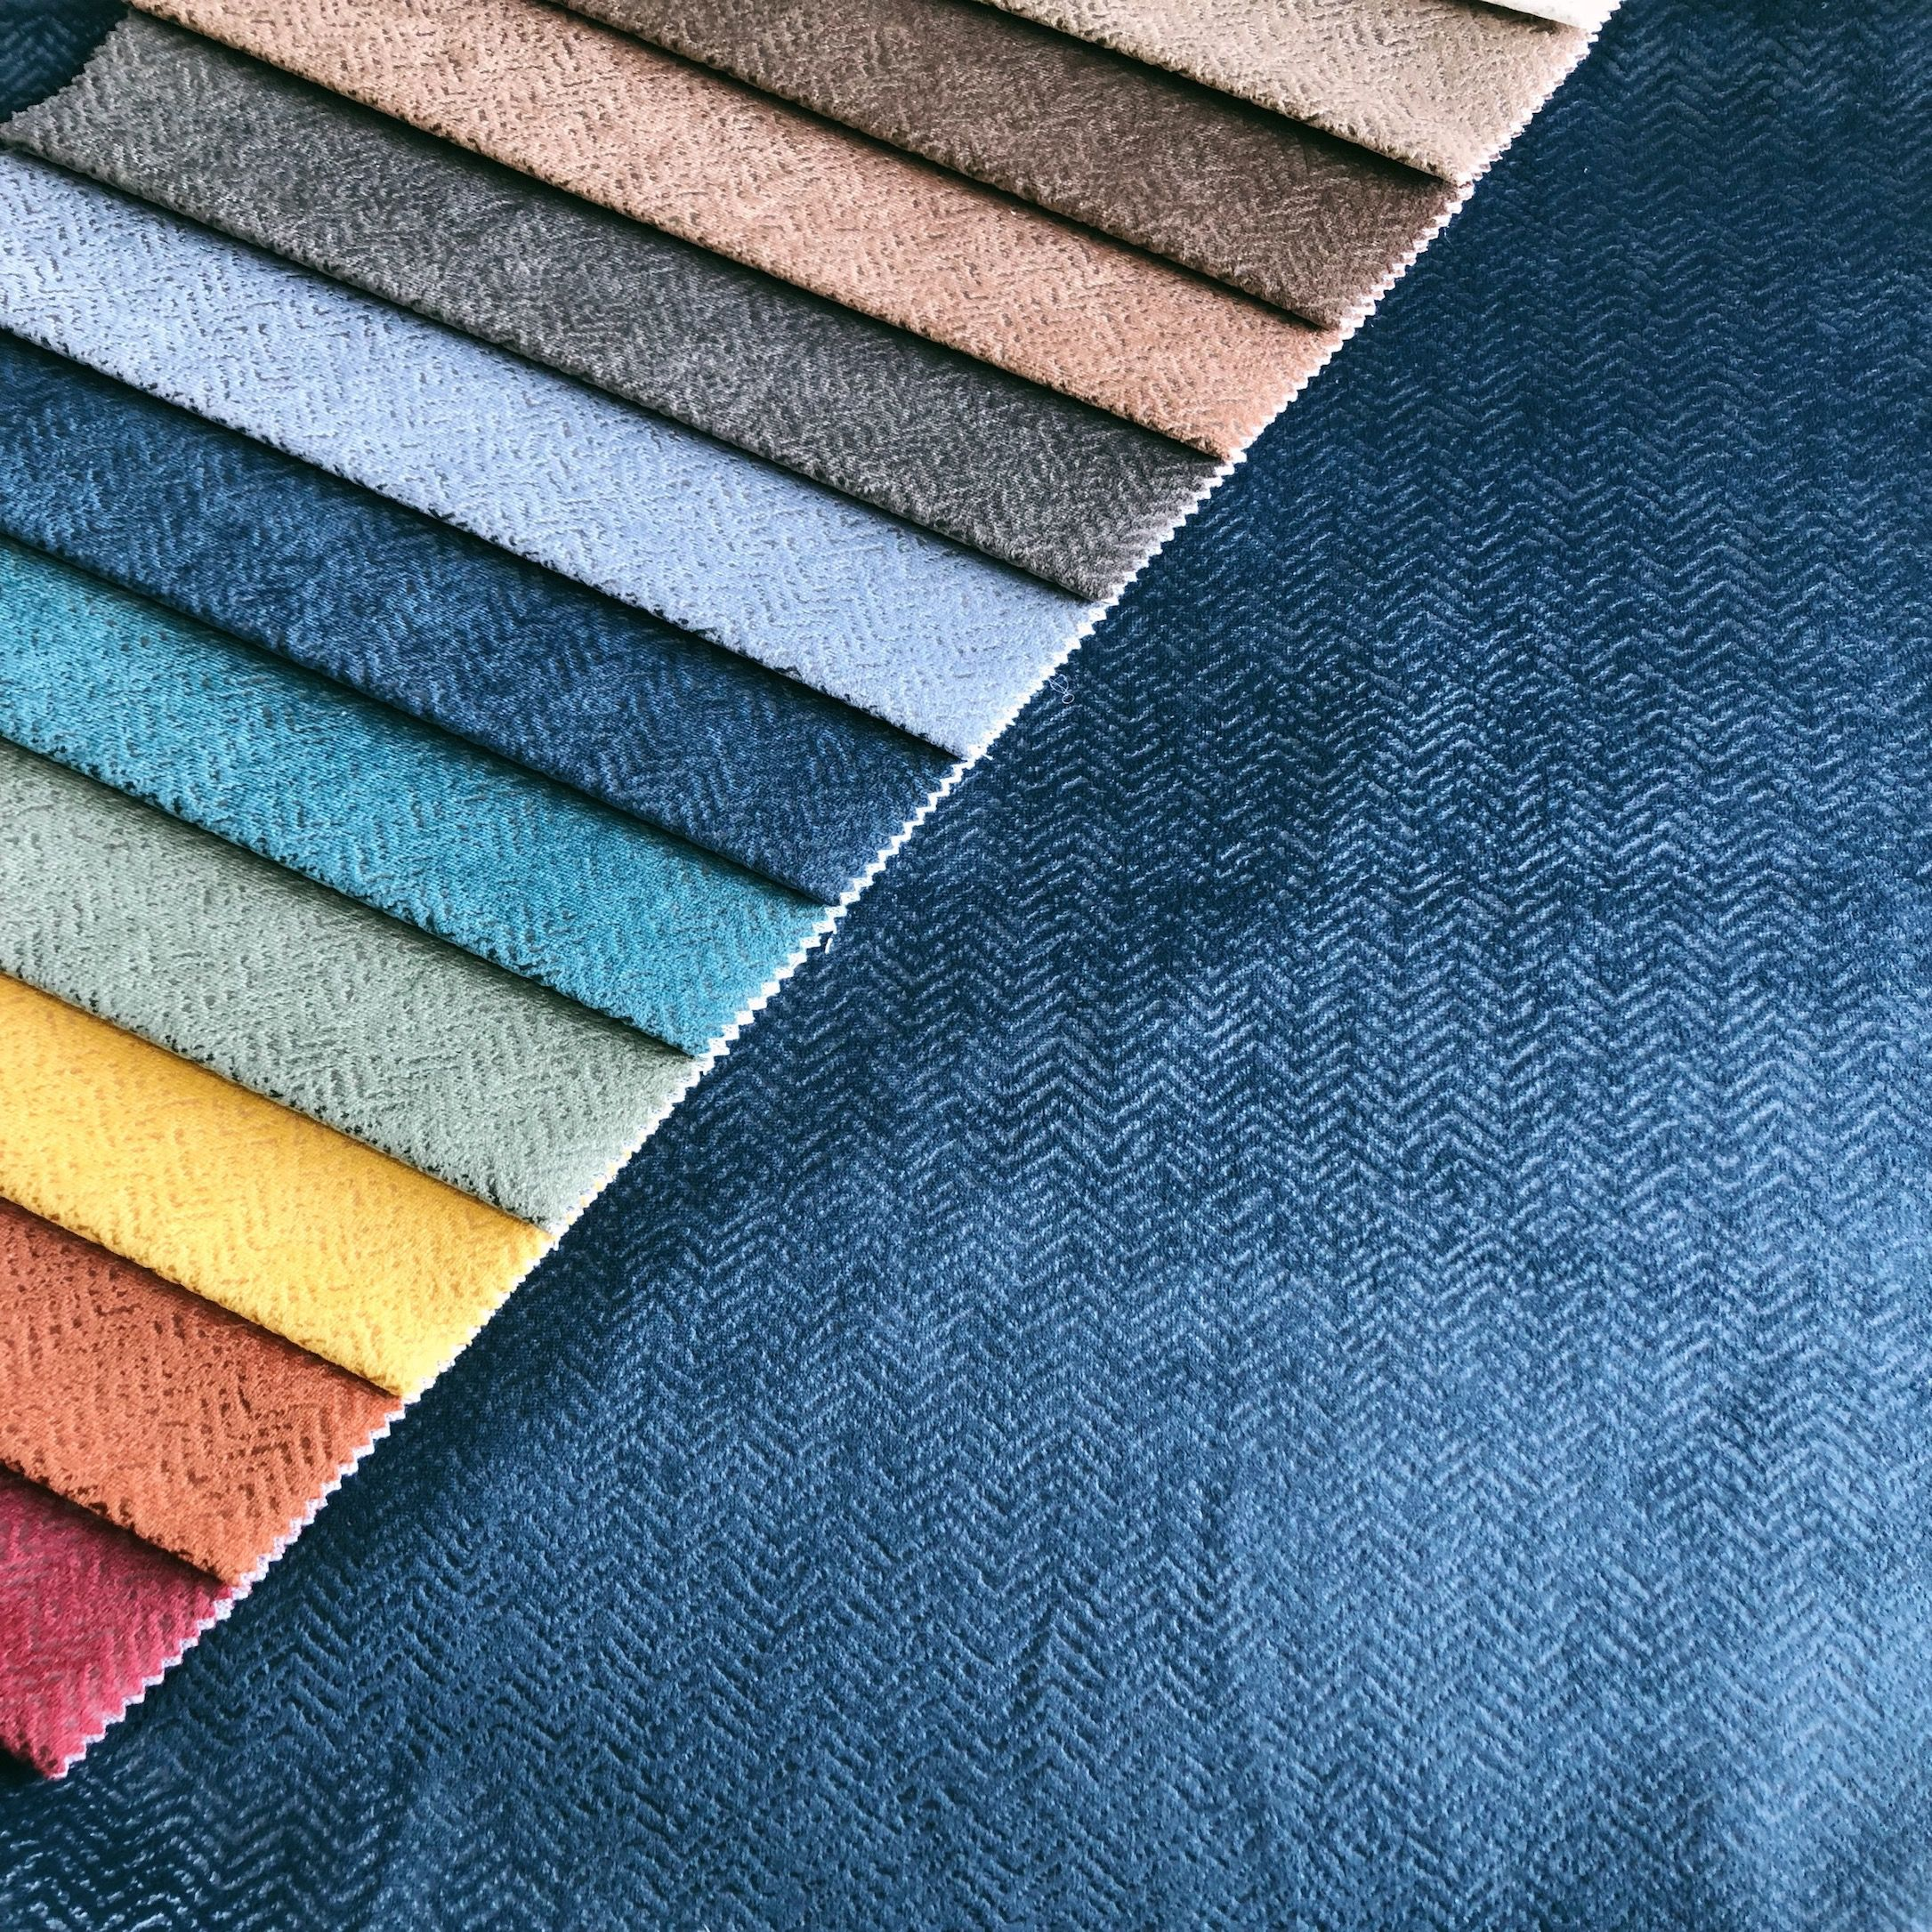 2 05 Sofa Fabric Fabric Sofa Fabric Online Chinese Fabric